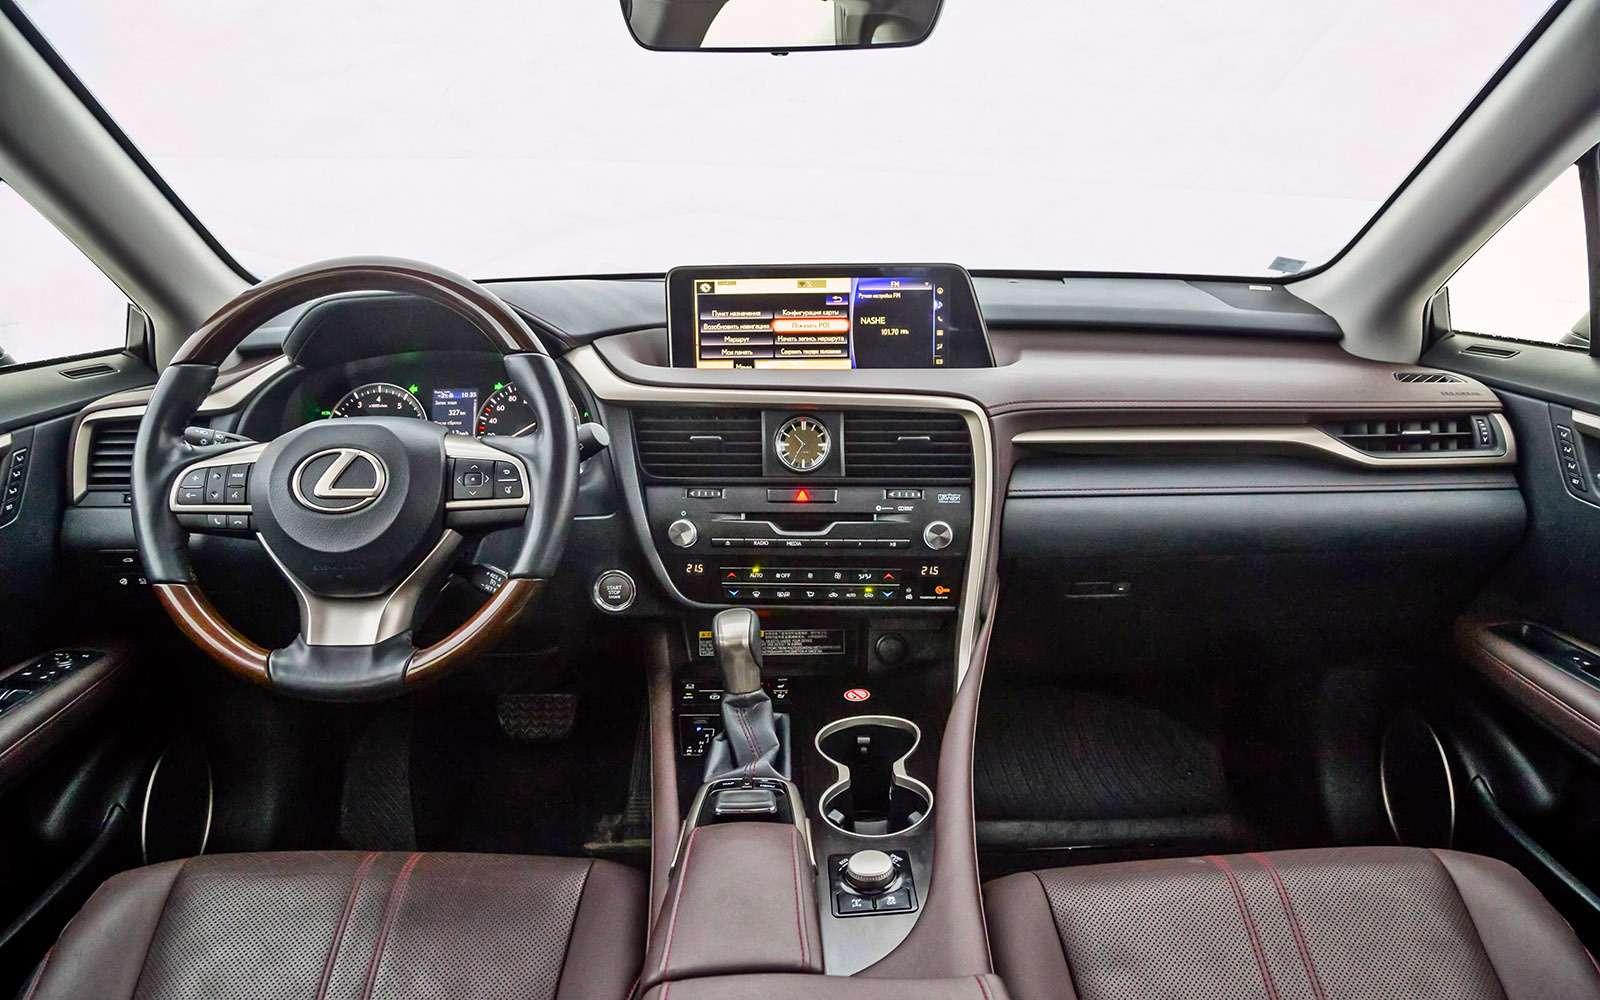 Тест премиум-кроссоверов: Lexus RX350, Cadillac XT5и Jaguar F-Pace— фото 721778